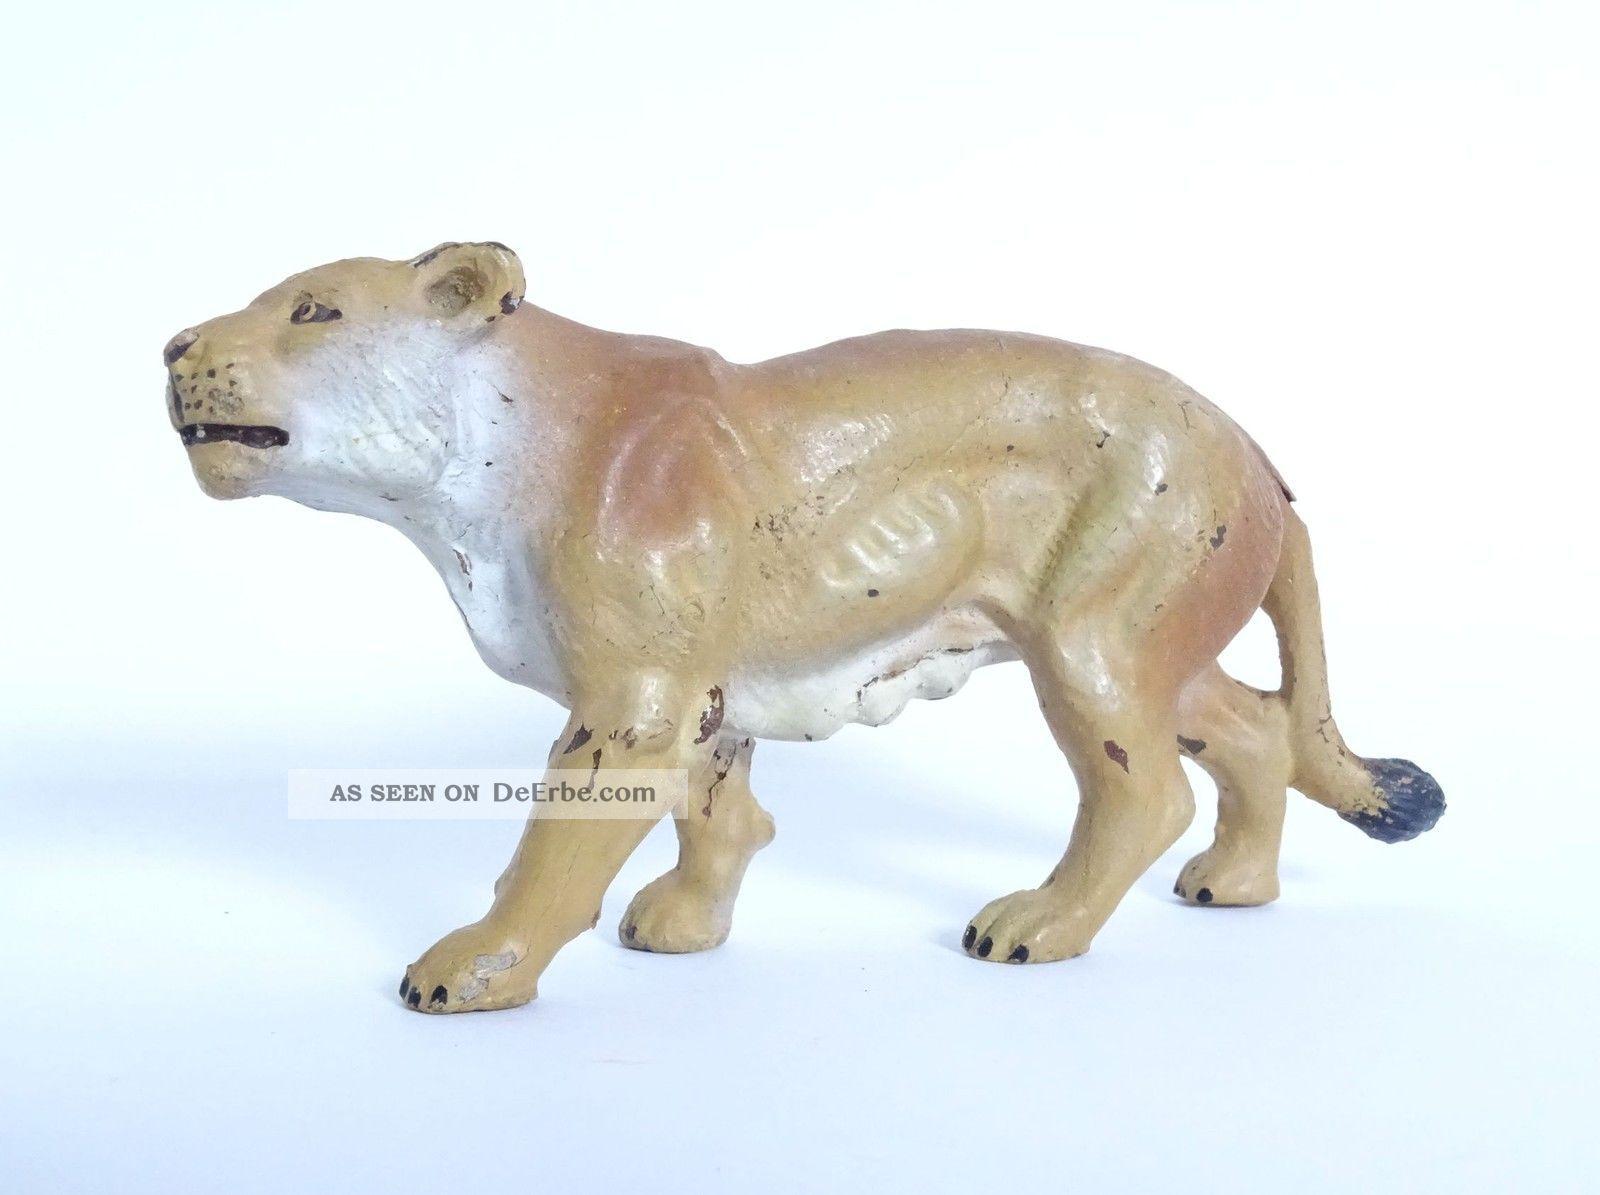 Antike Elastolin Lineol Löwe Löwin Raub Tier Figur Massefigur Rarität Elastolin & Lineol Bild